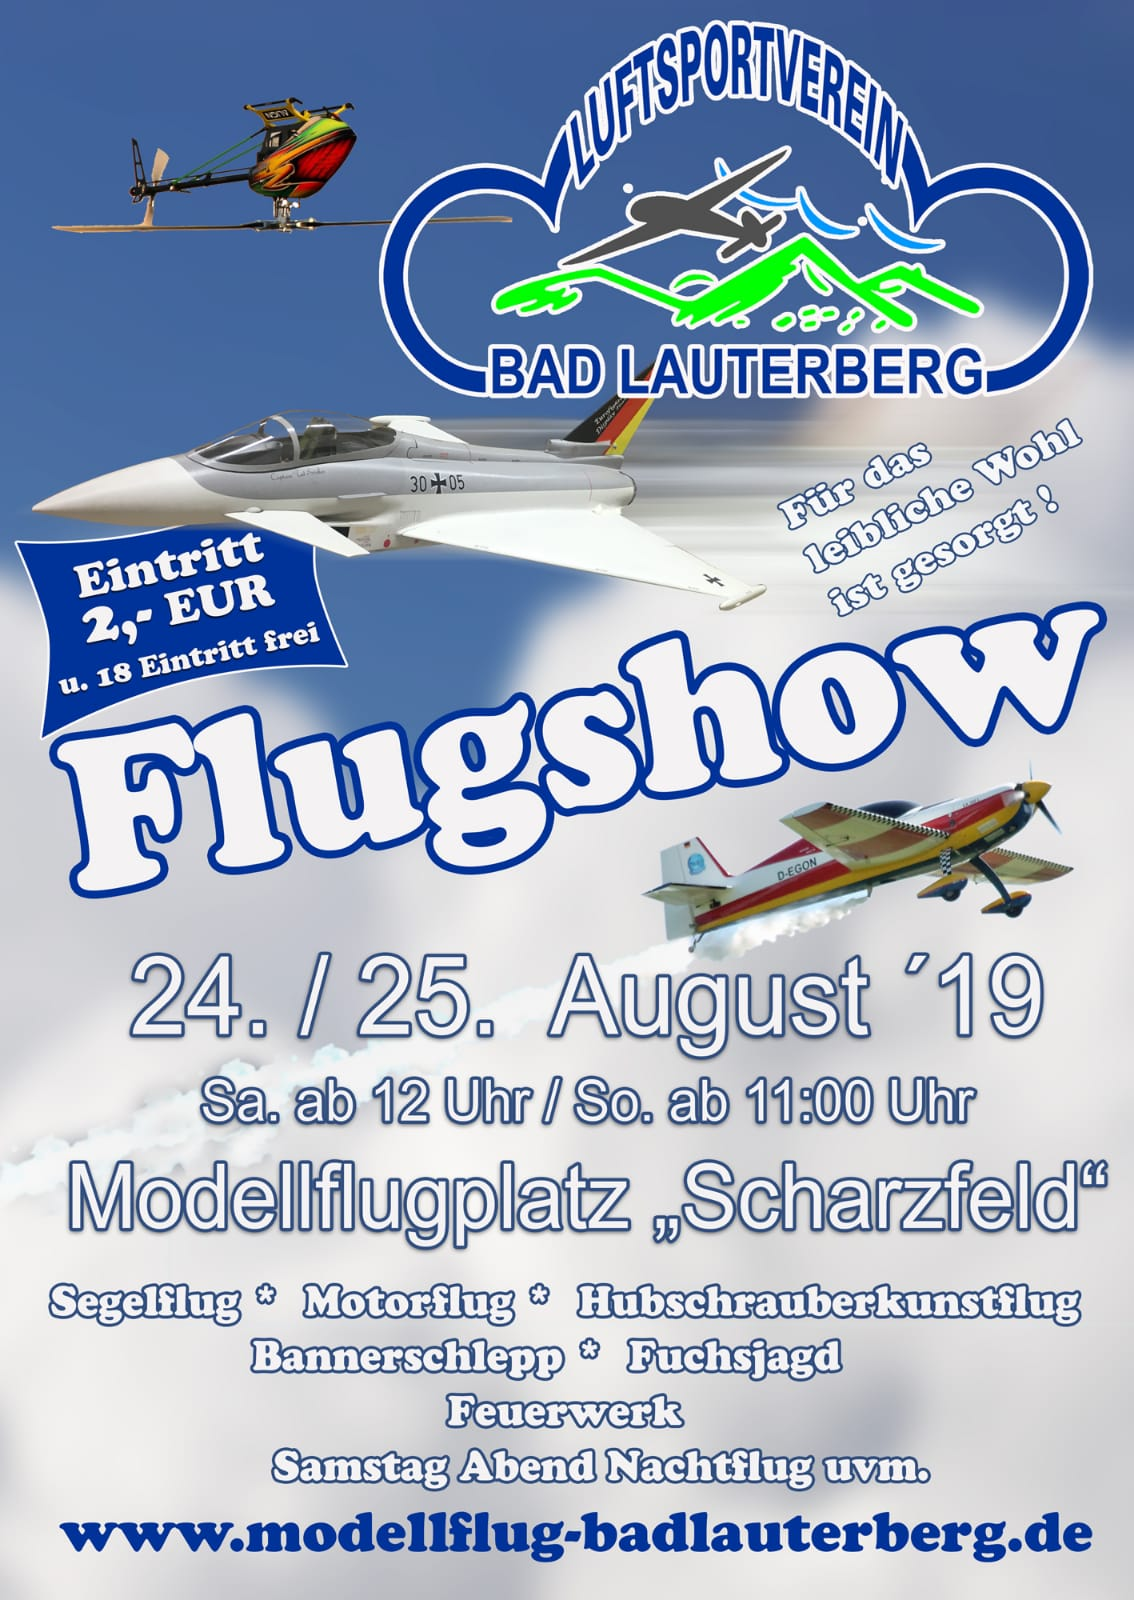 Flugtag des LSV Bad Lauterberg @ Modellflugplatz Scharzfeld Hottenberg | Herzberg am Harz | Niedersachsen | Deutschland